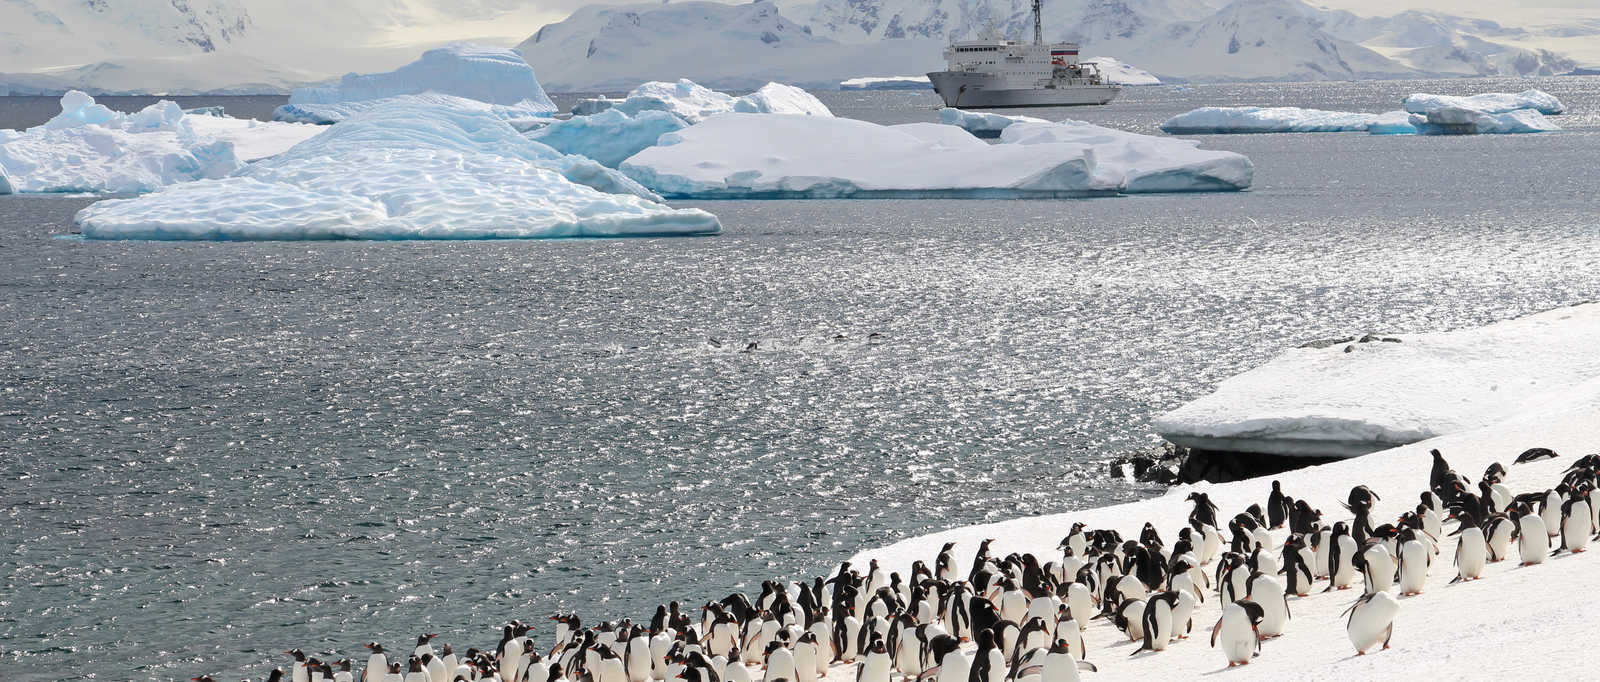 Gentoo penguin colony, Cuverville Island, Antarctica